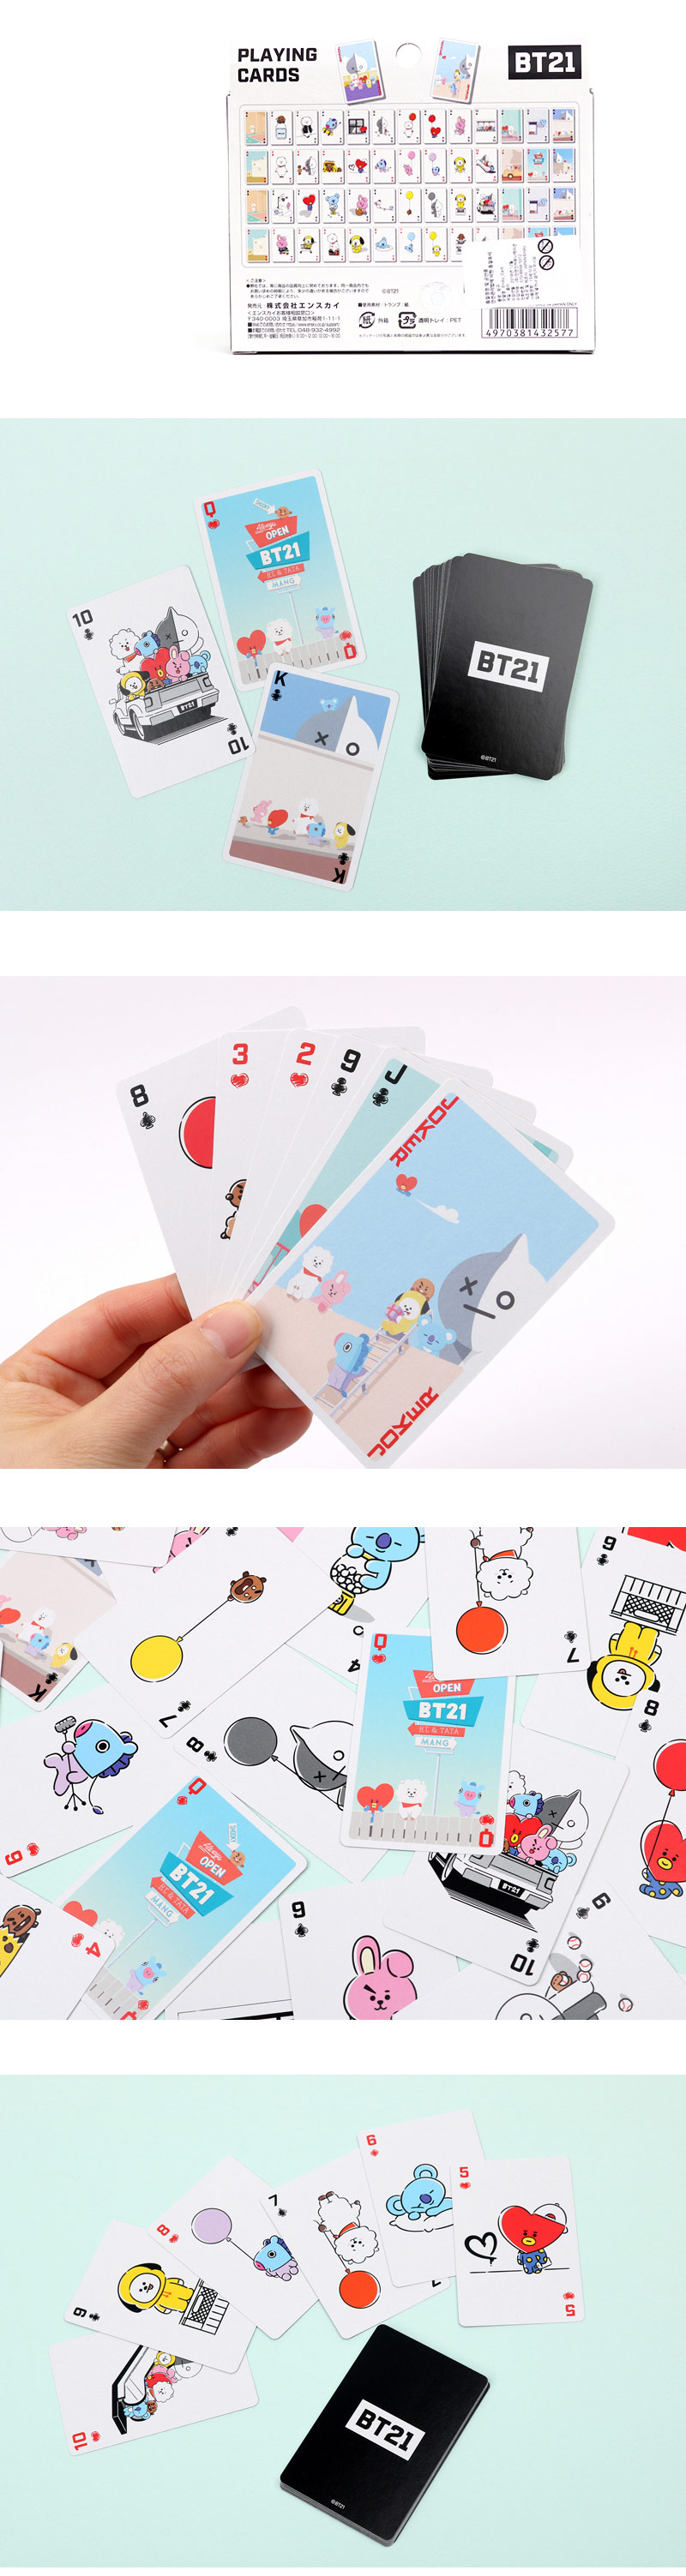 bt21_playing_card-3